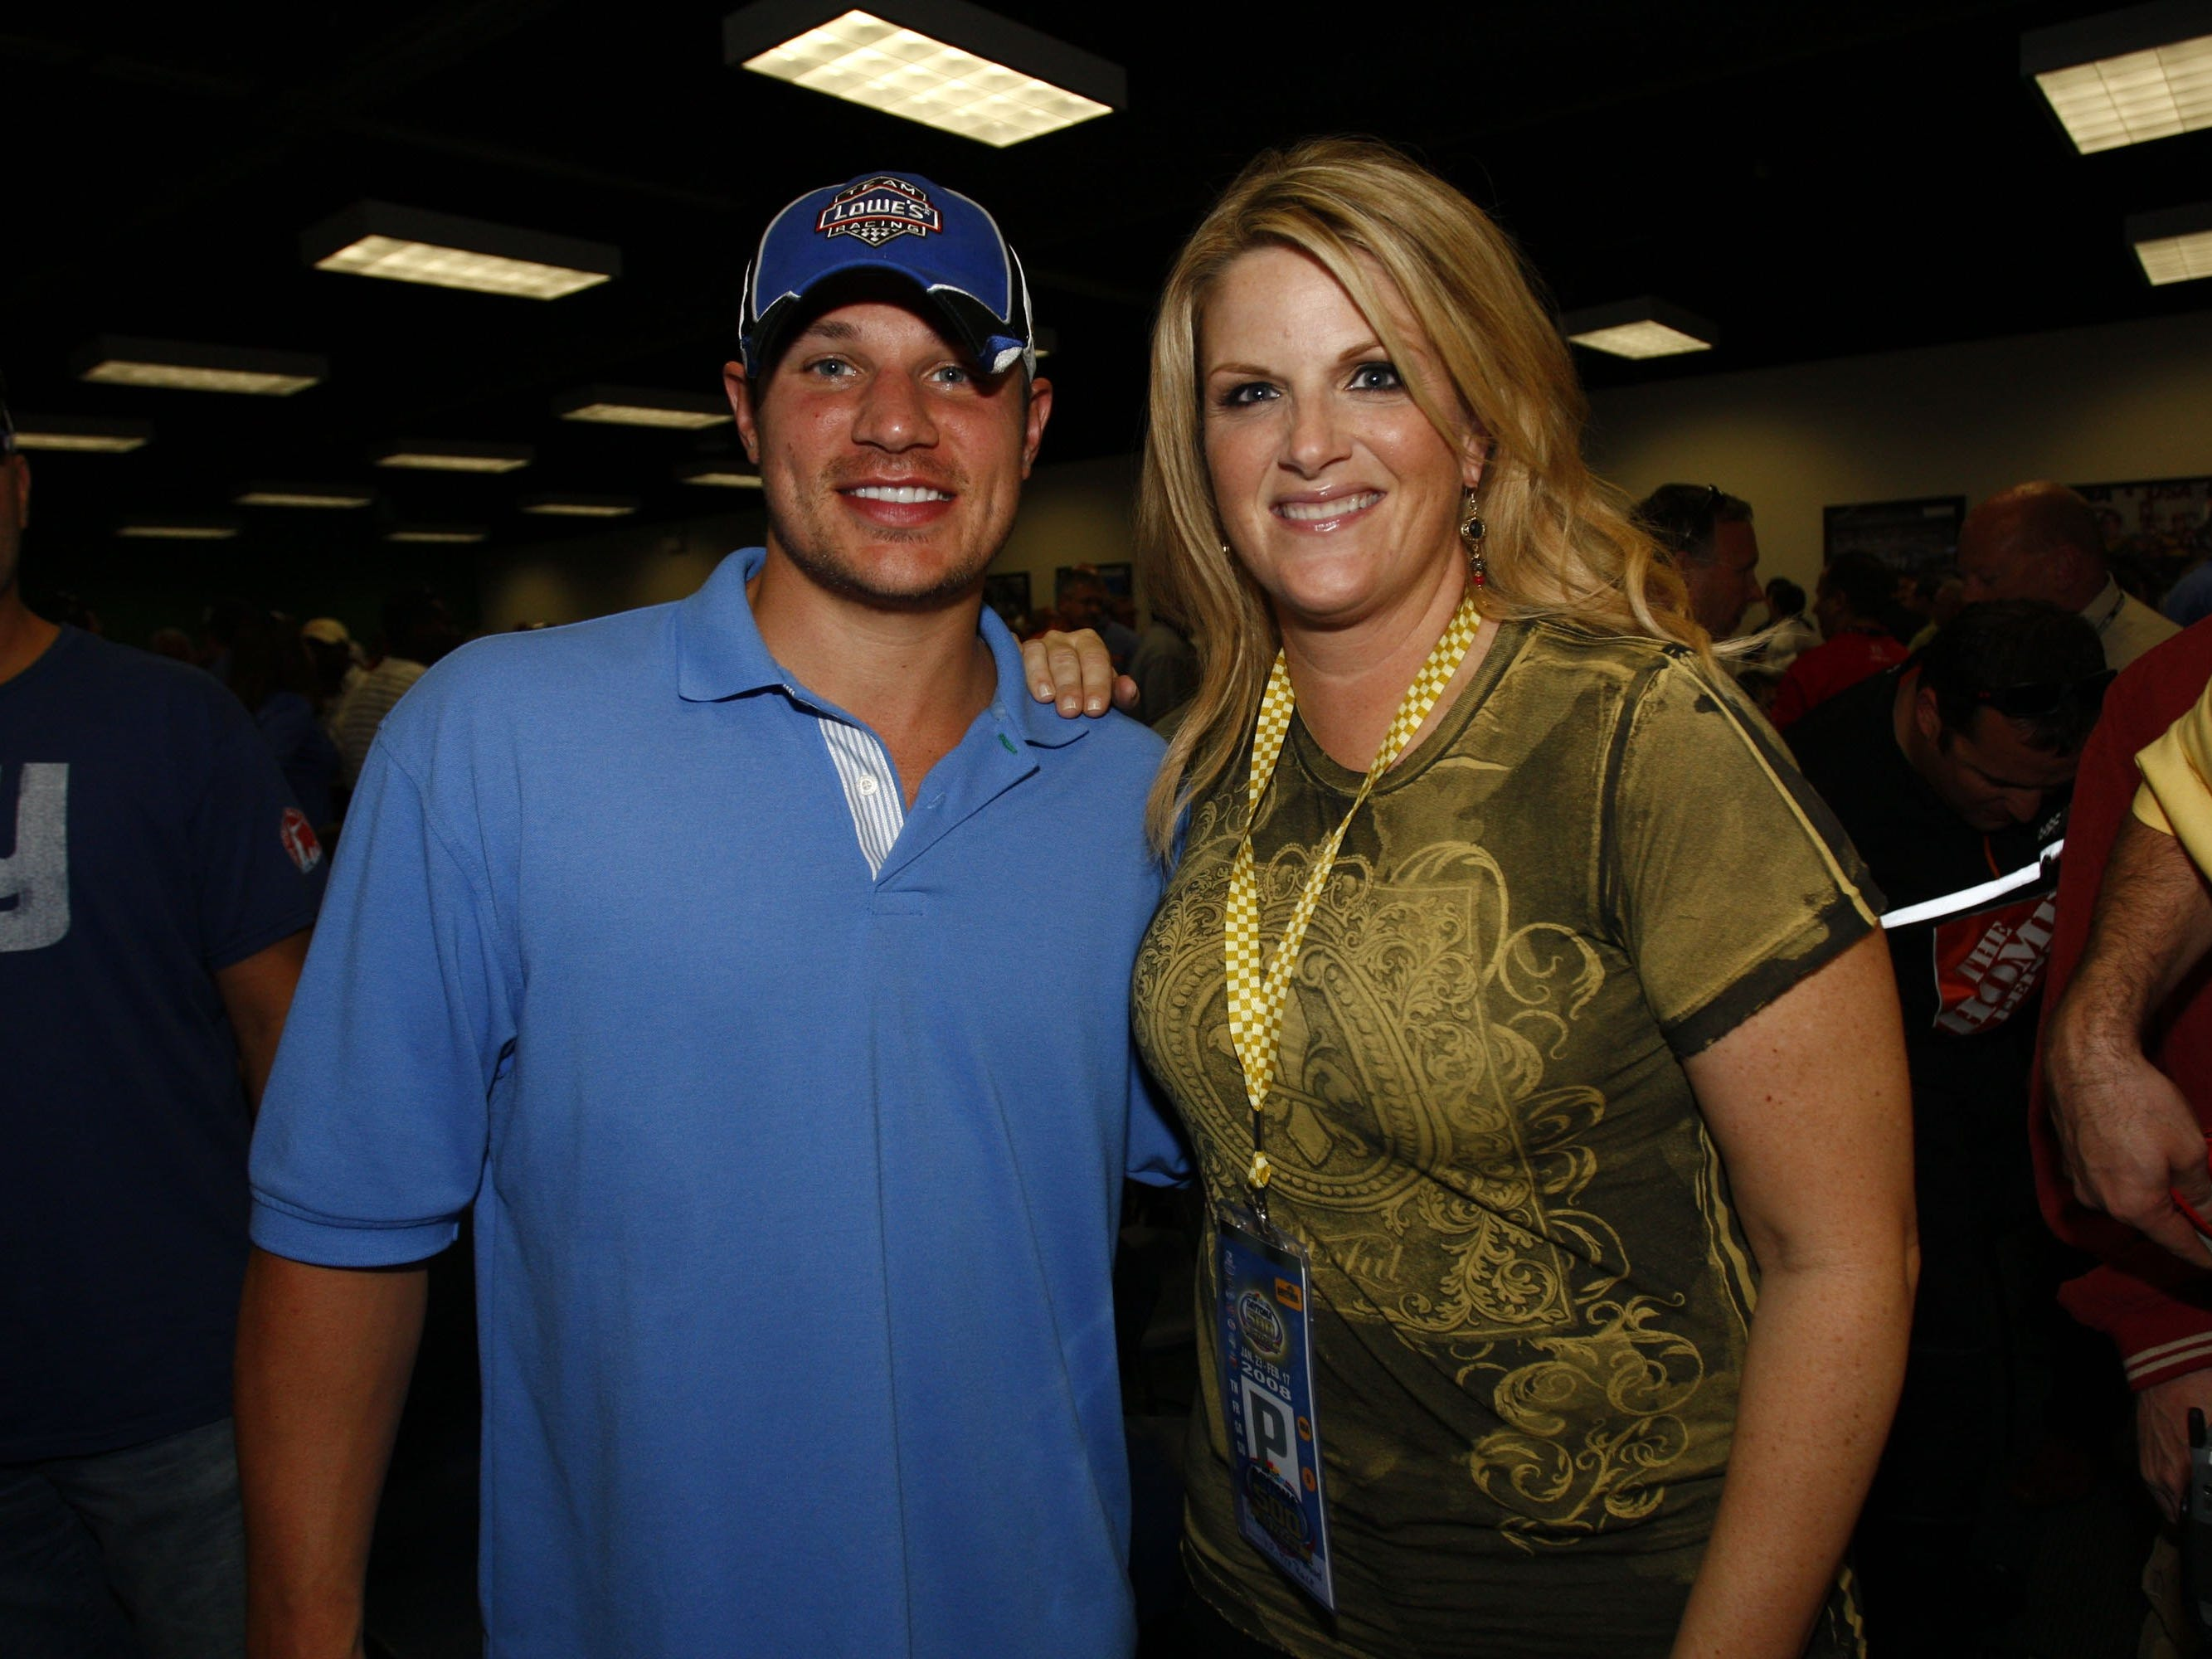 Trisha Yearwood with Nick Lachey prior to the running of the NASCAR Sprint Cup Series Daytona 500 at Daytona International Speedway on February 17, 2008 in Daytona Beach, Florida.